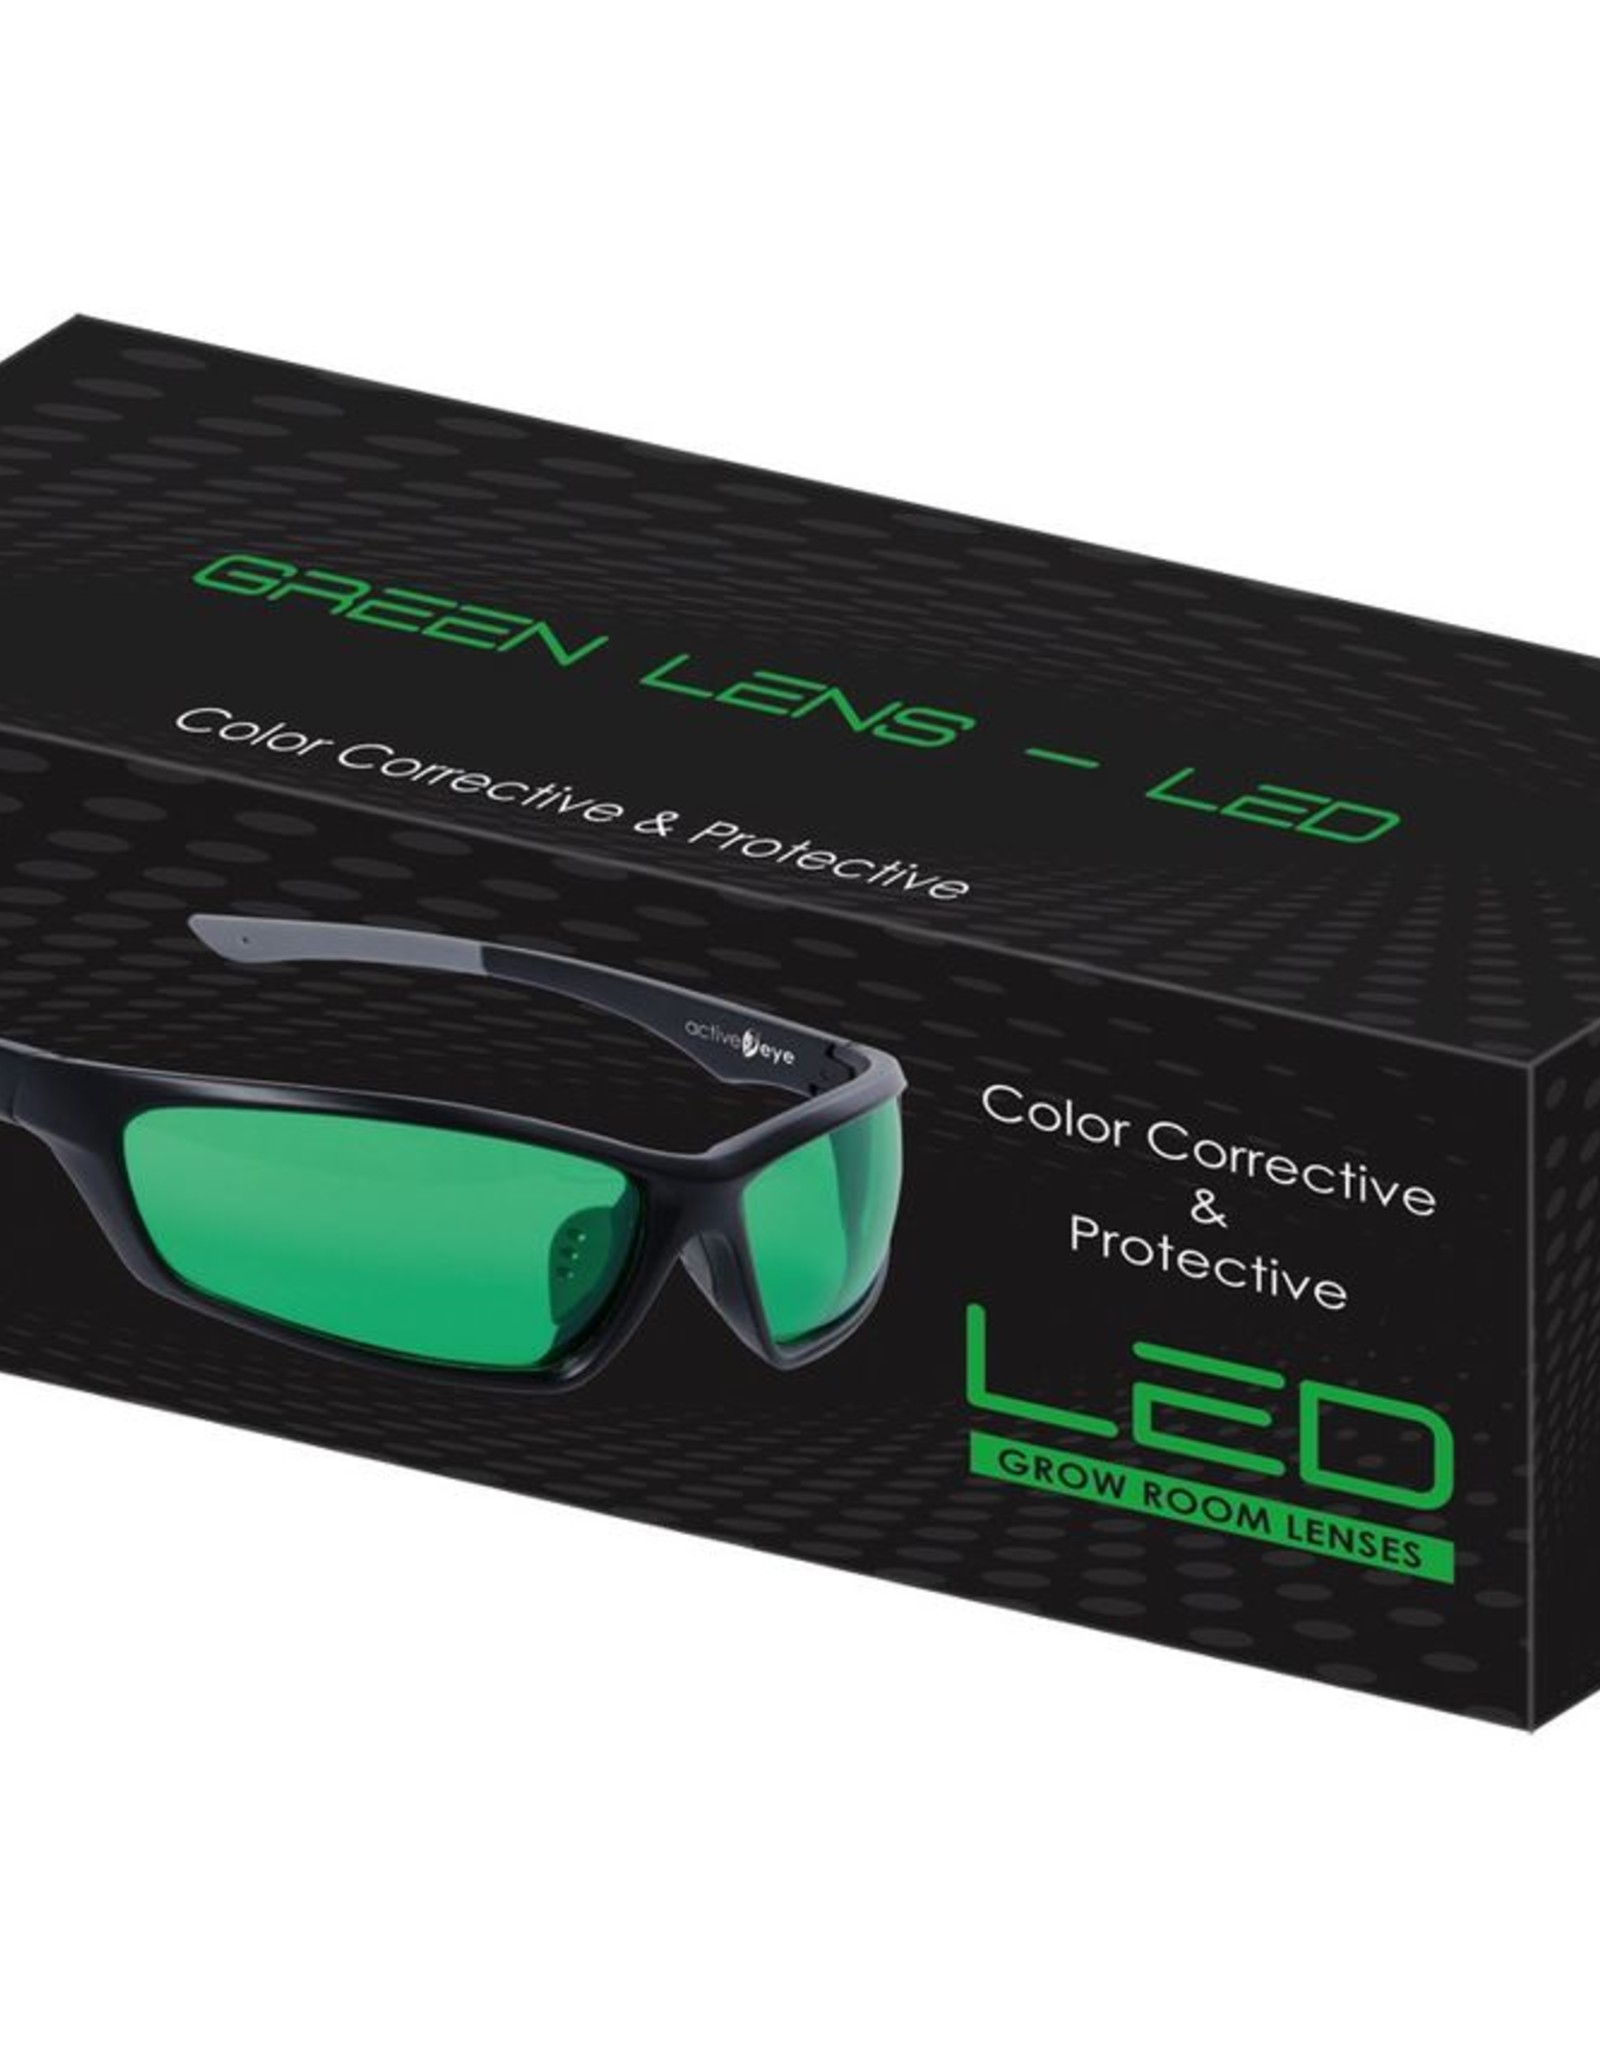 ACTIVE AIR Active Eye LED Grow Room Lenses